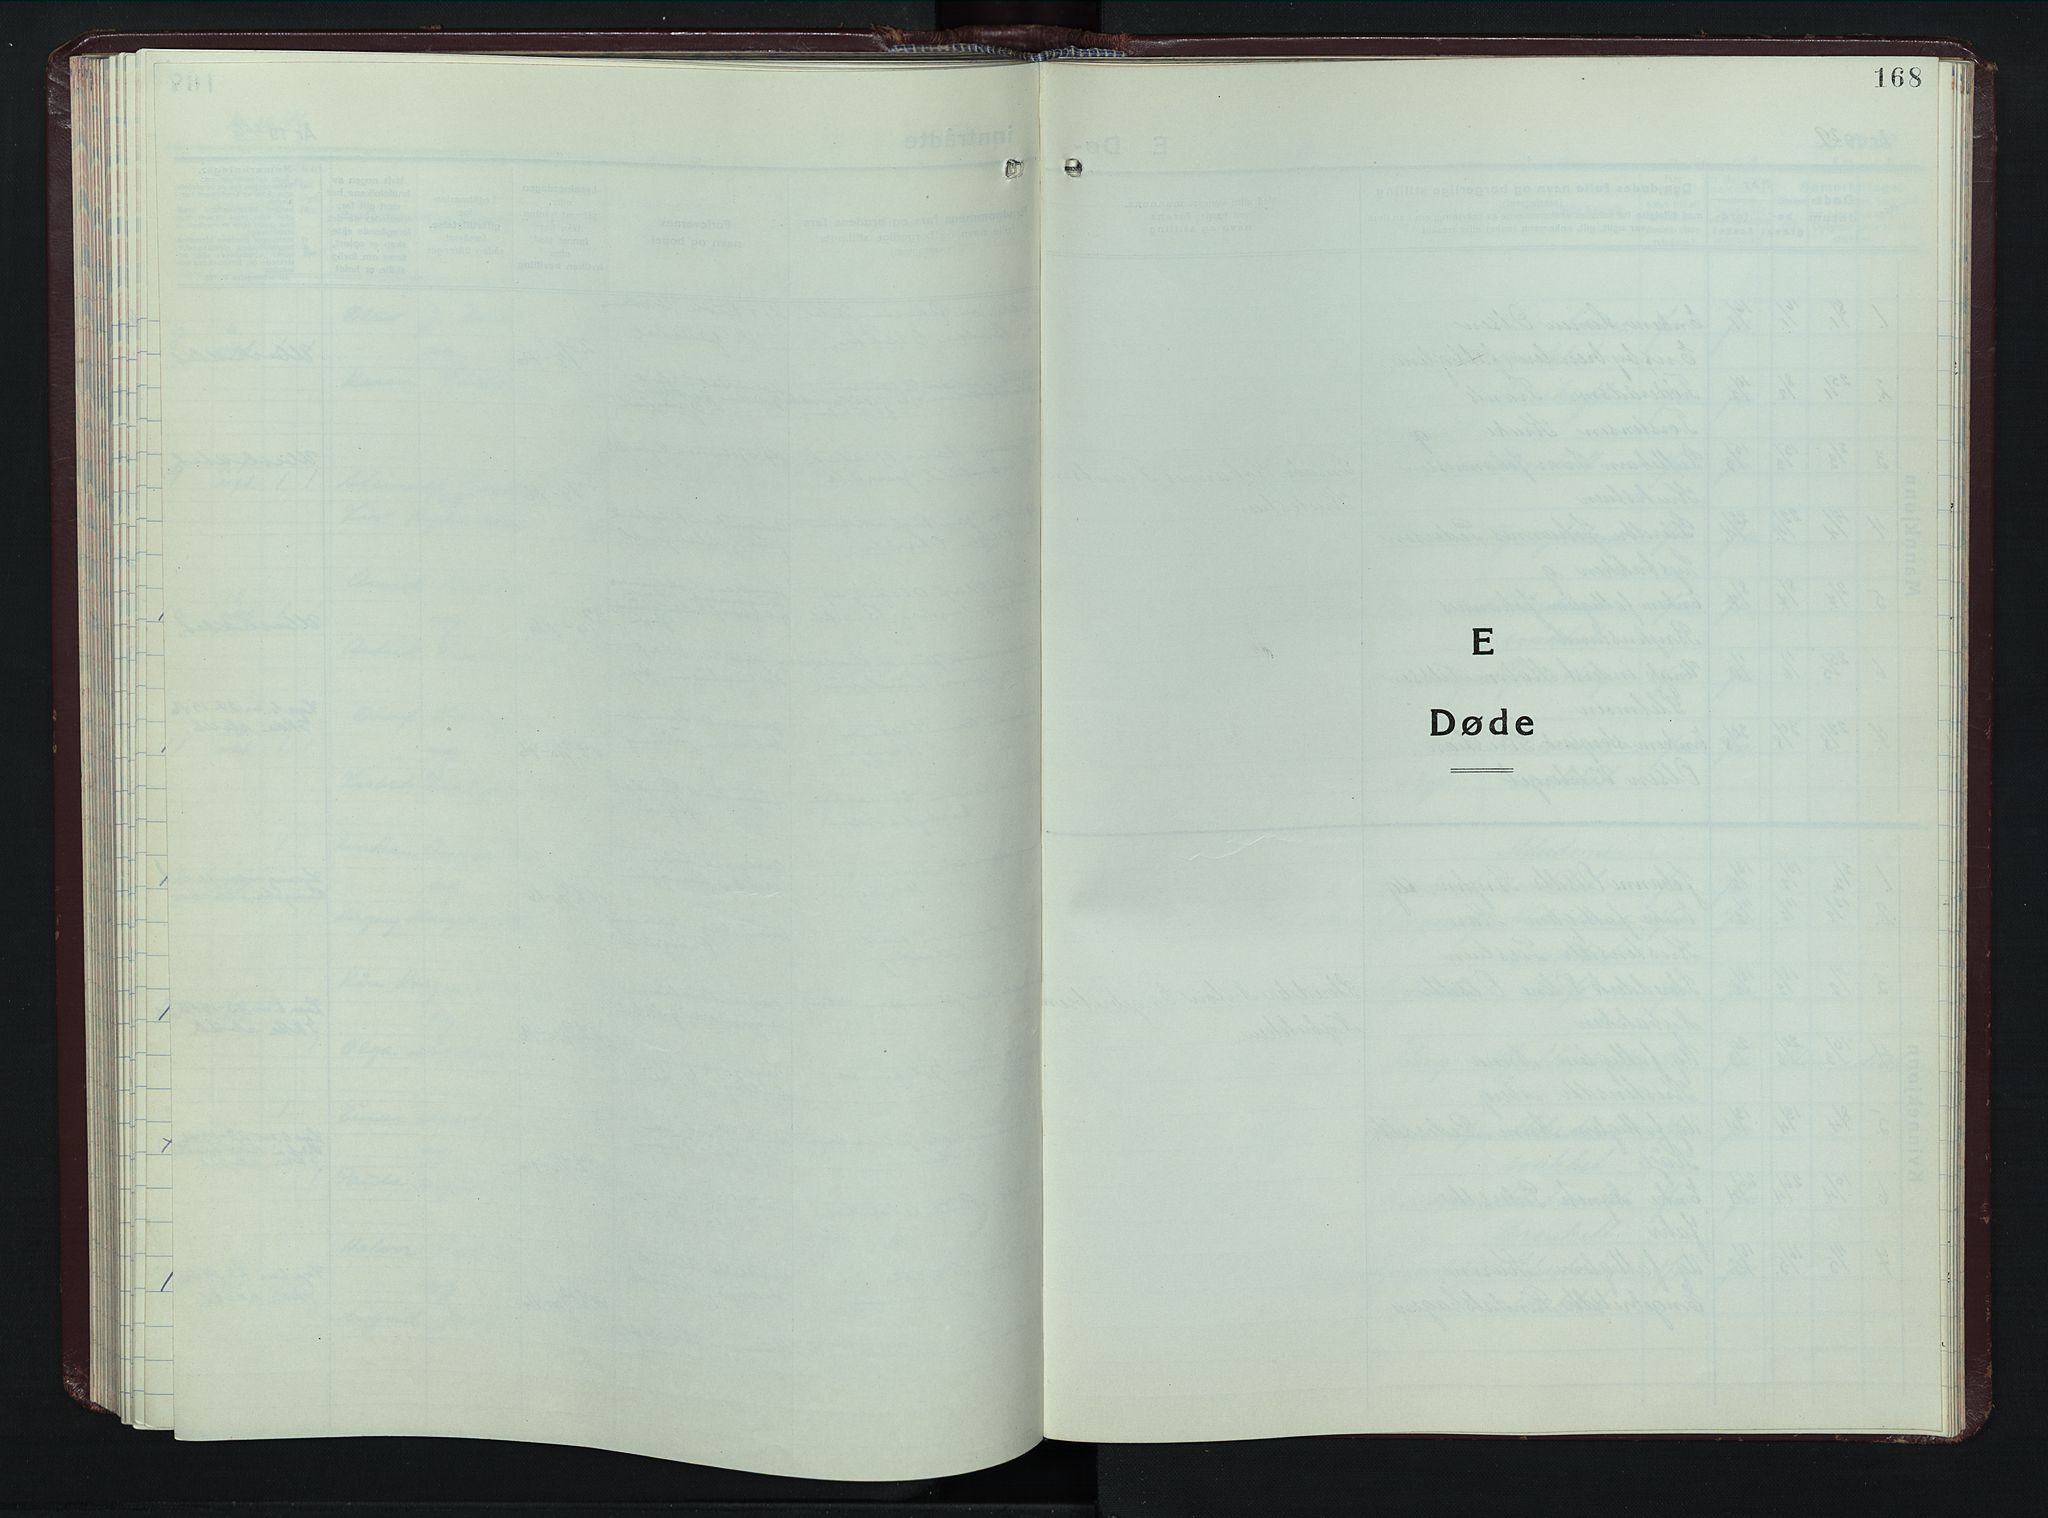 SAH, Øyer prestekontor, Klokkerbok nr. 8, 1929-1947, s. 168